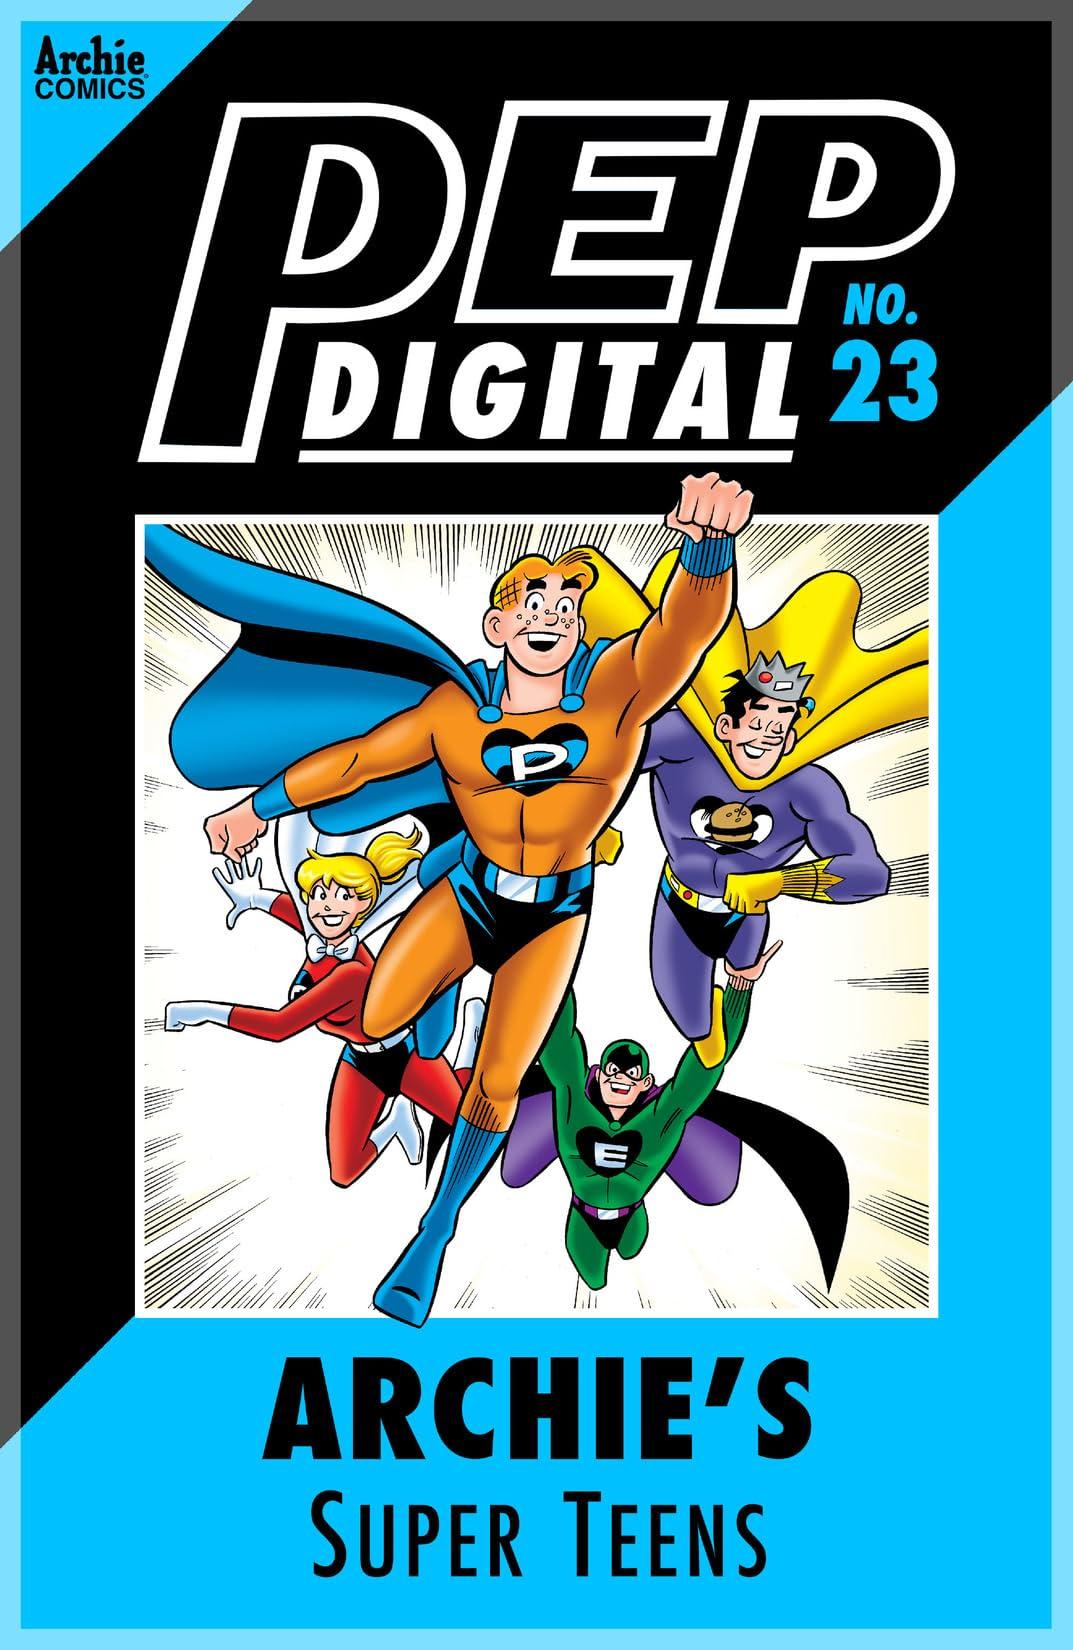 PEP Digital #23: Archie's Super Teens